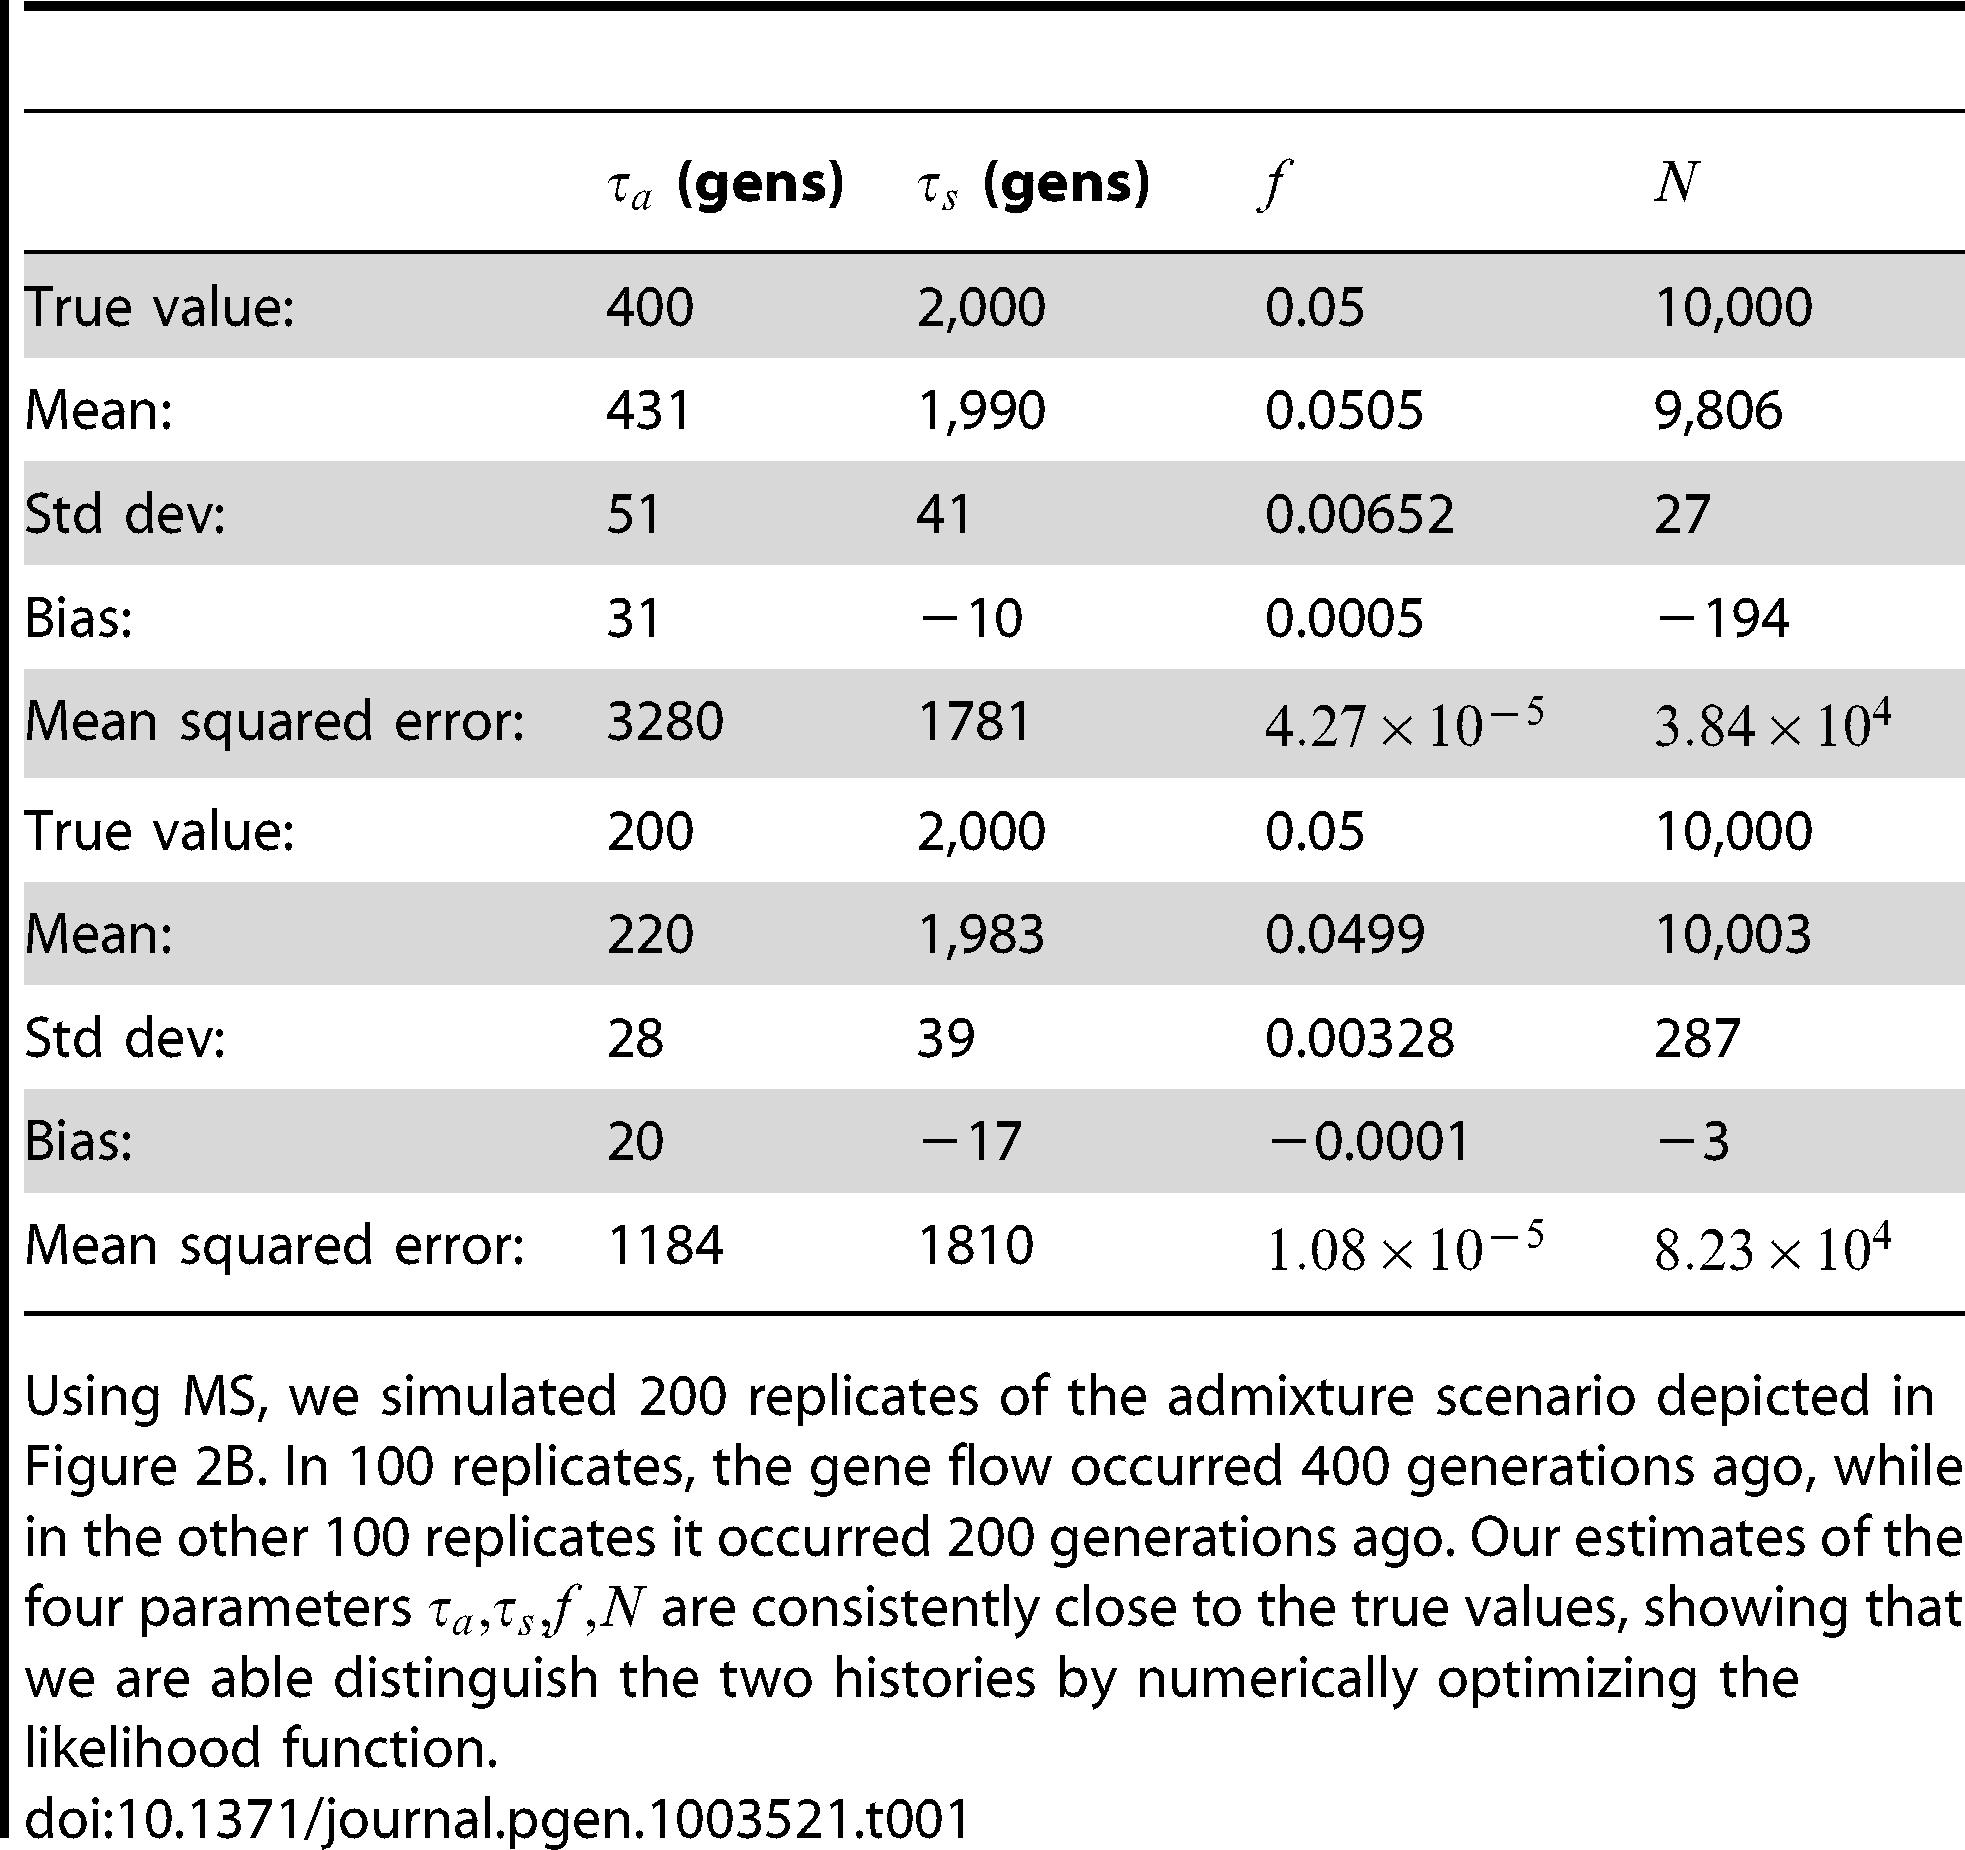 Inferring the parameters of a simple admixture scenario.